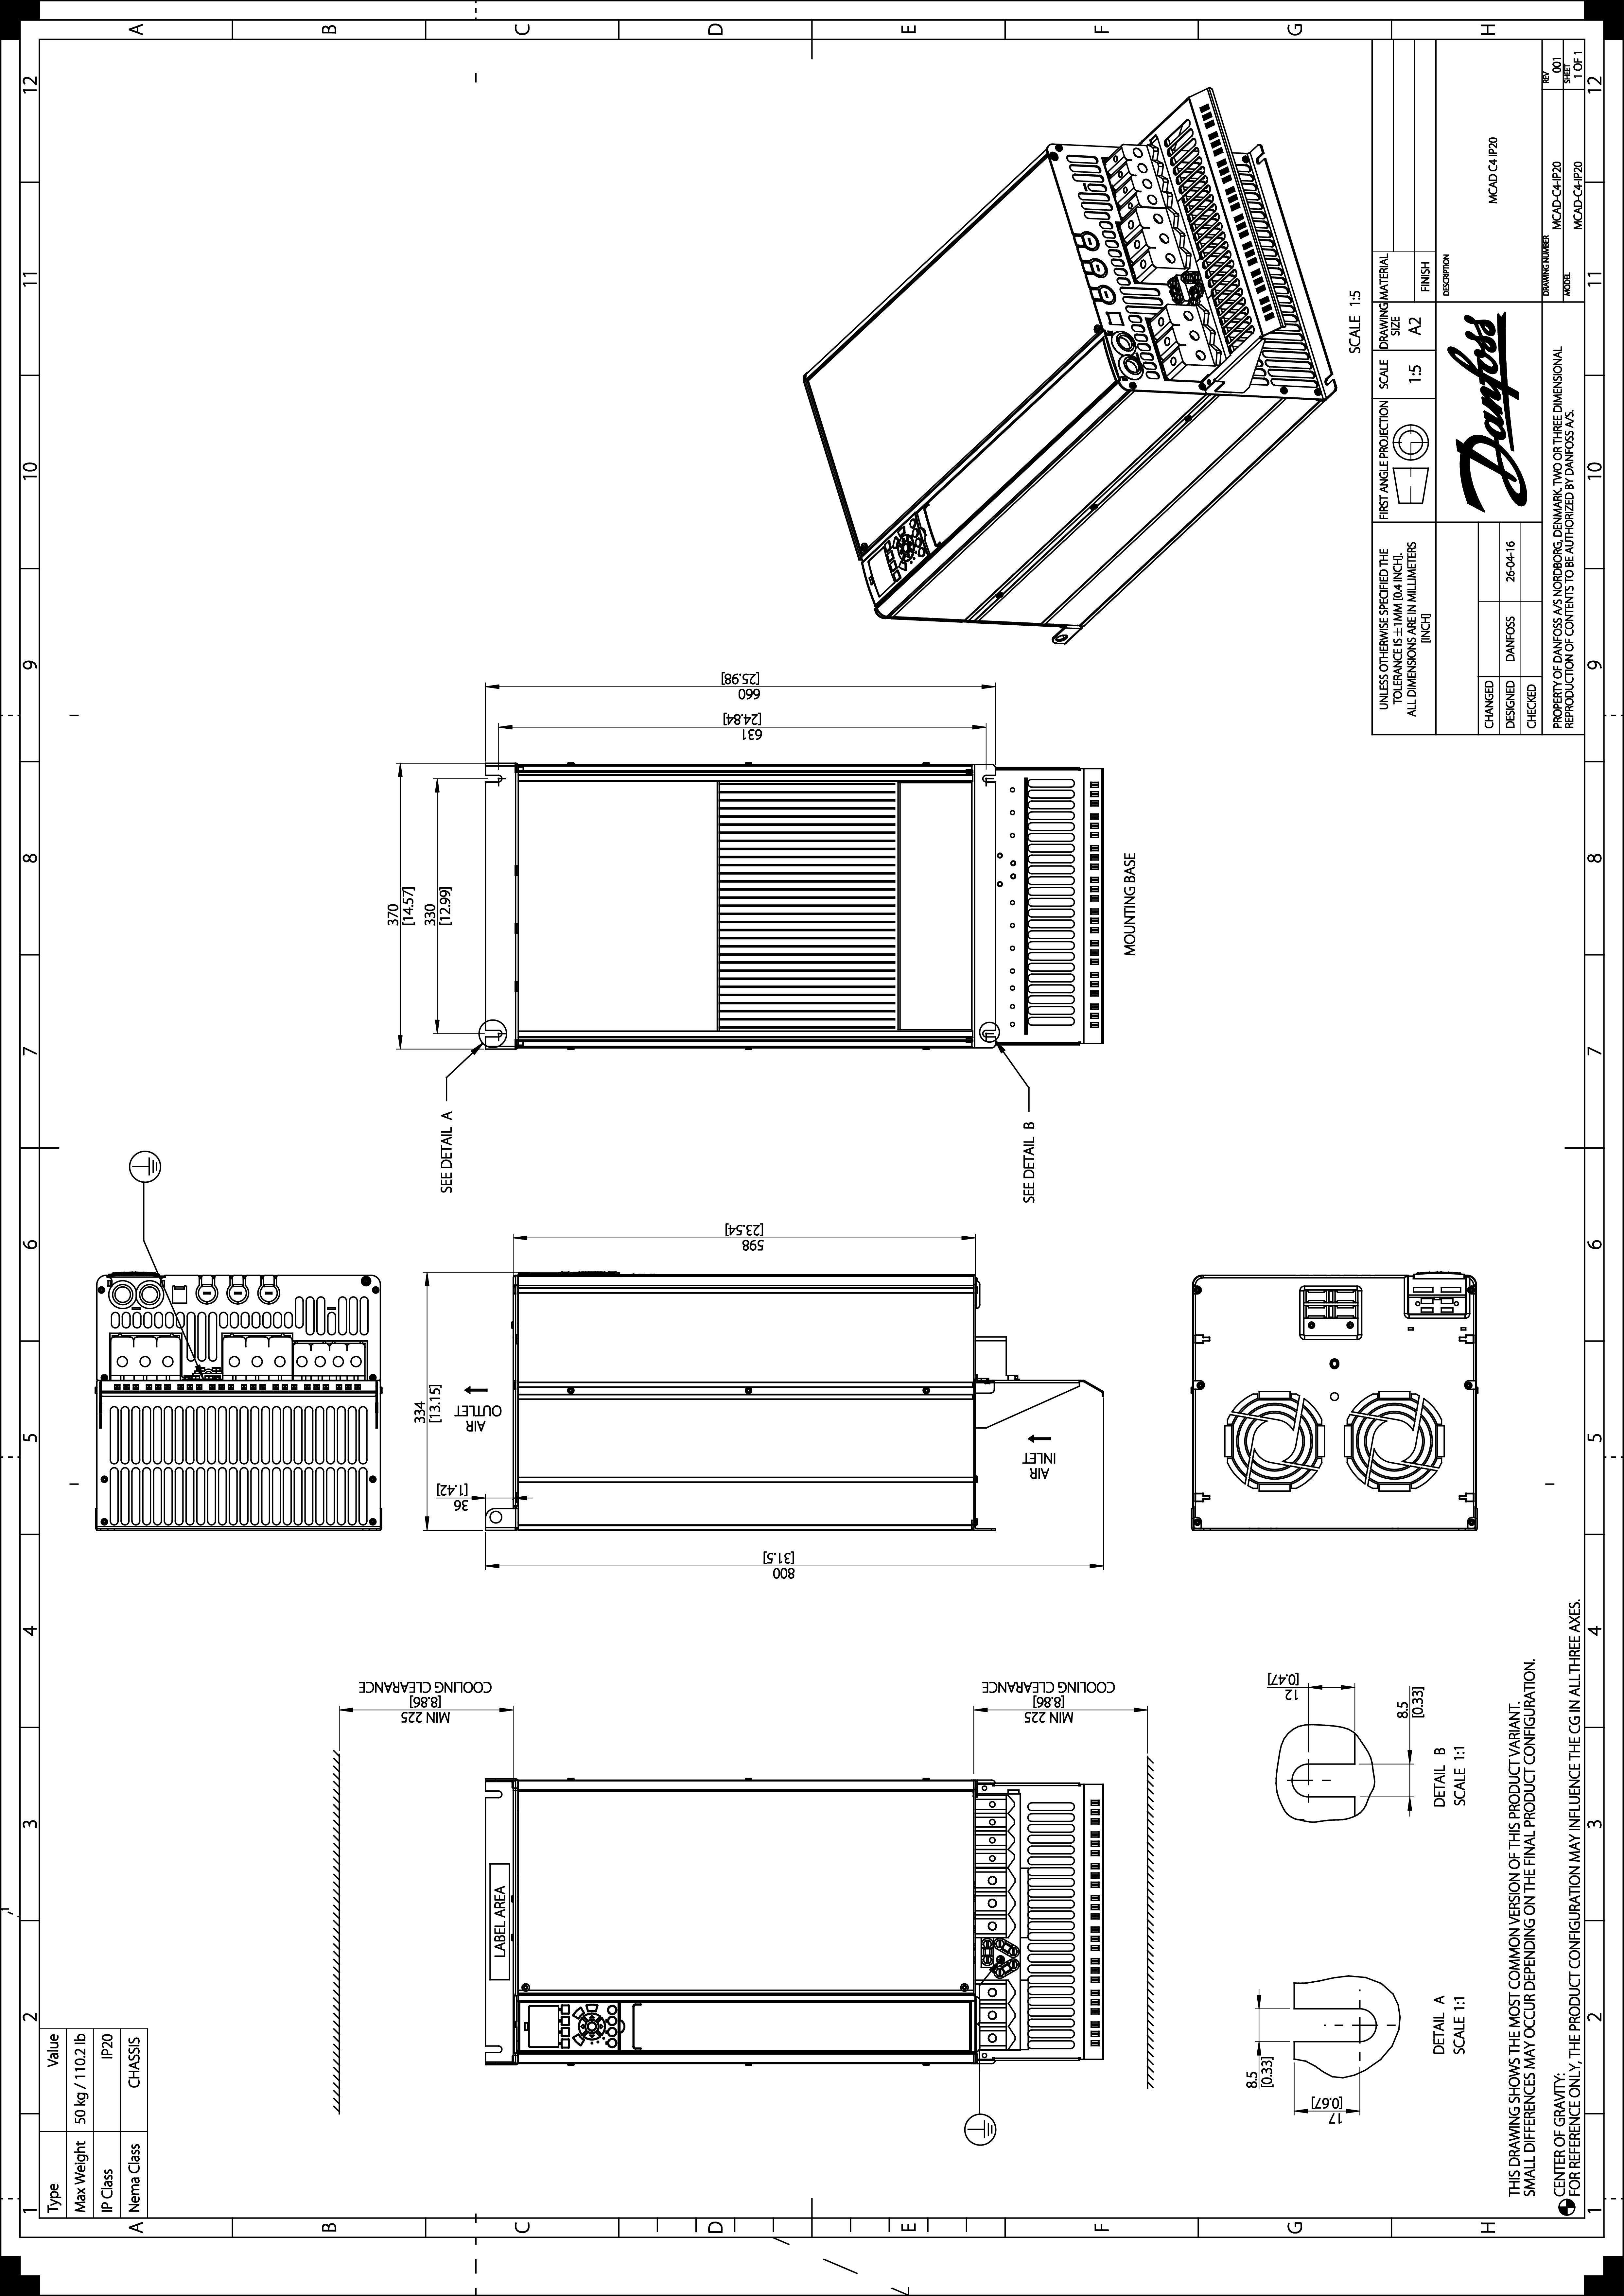 Enhanced Vlt Hvac Drive Fc 102 Danfoss Ac System Electric Schematic Diagram 30 Mb